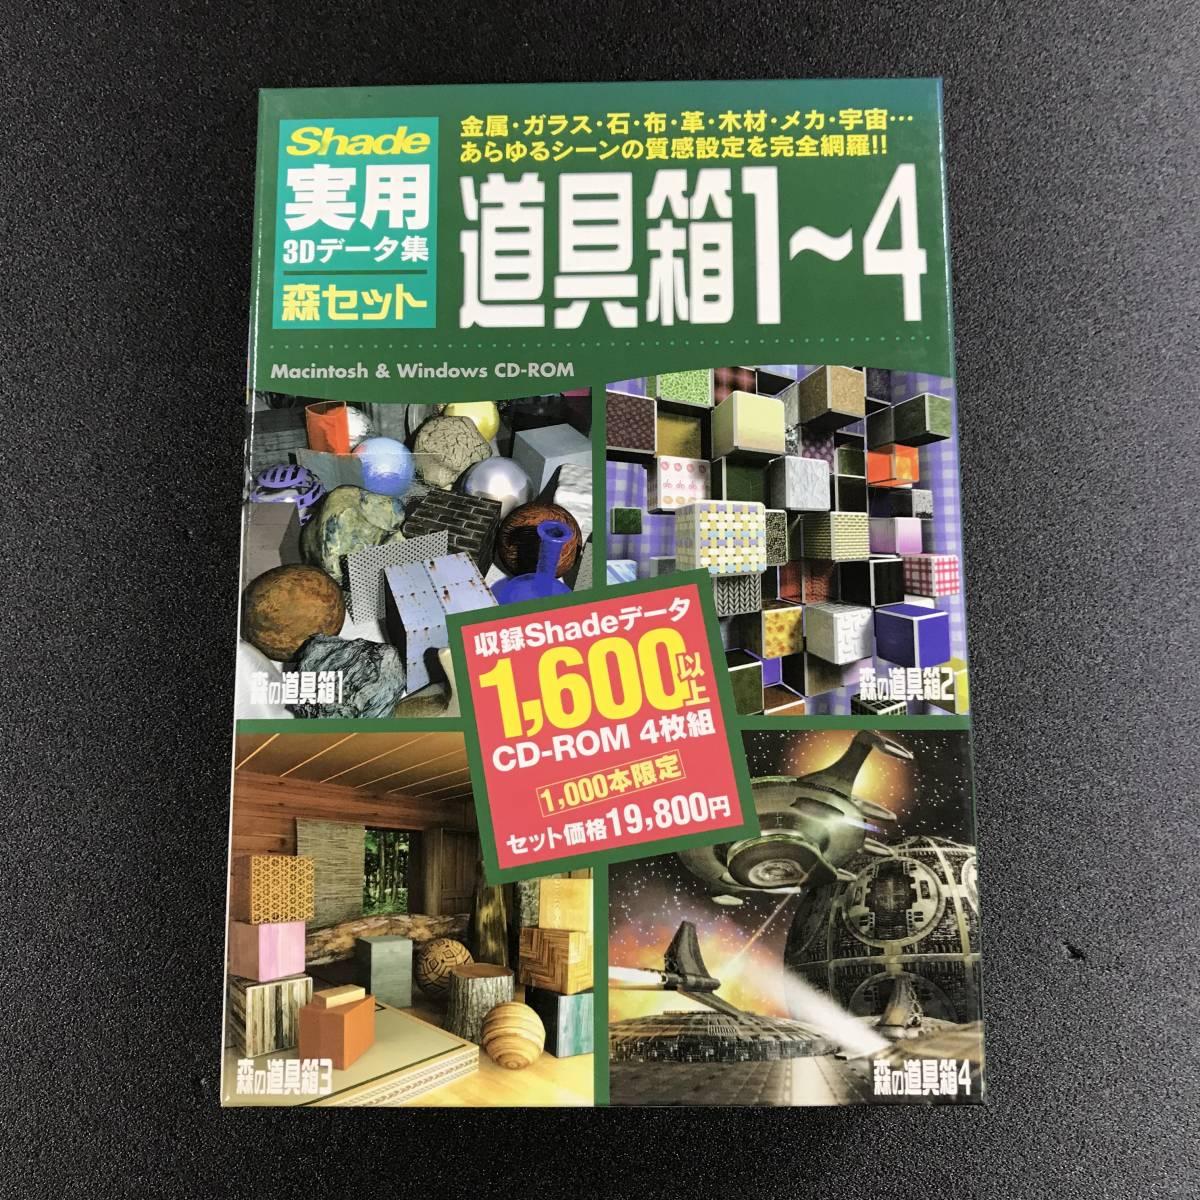 Shade実用3Dデータ集 森の道具箱1~4